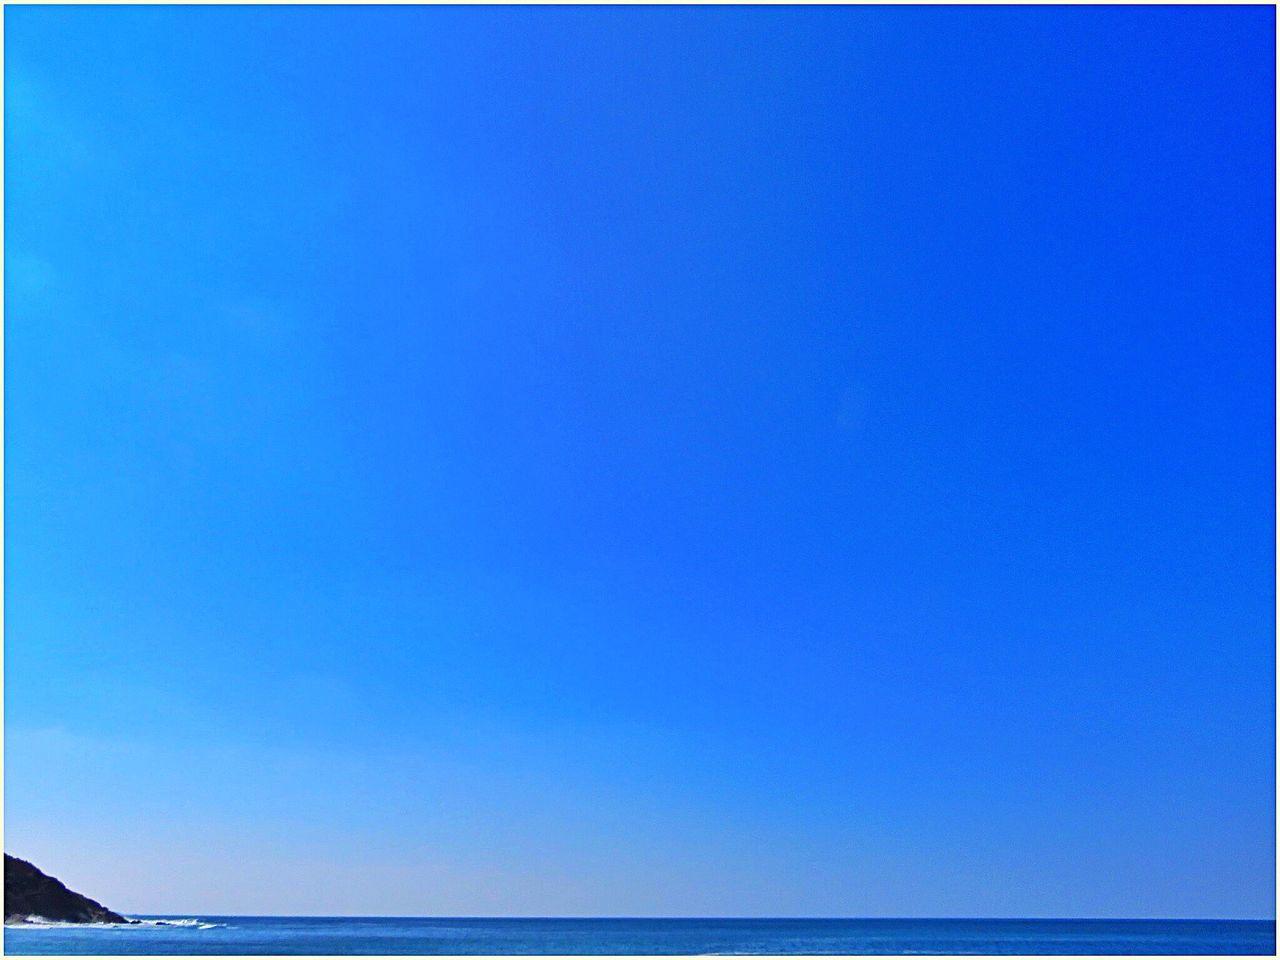 Smart Simplicity Lifeisabeach Monochrome Blue Minimalism Designedbynature Sky Taking Photos EyeEm Home